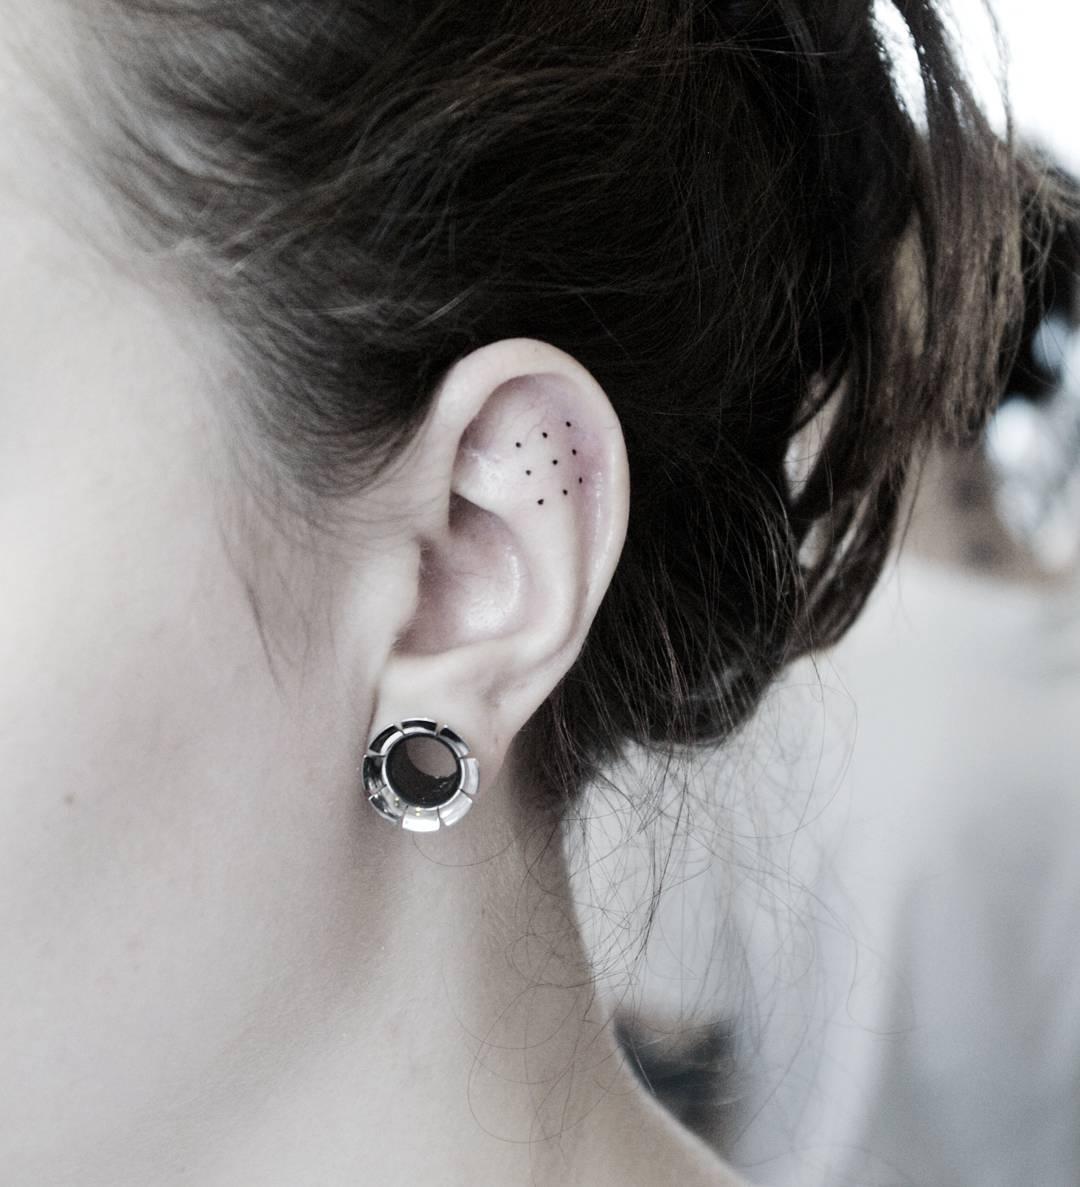 Татуировка на ухе фото